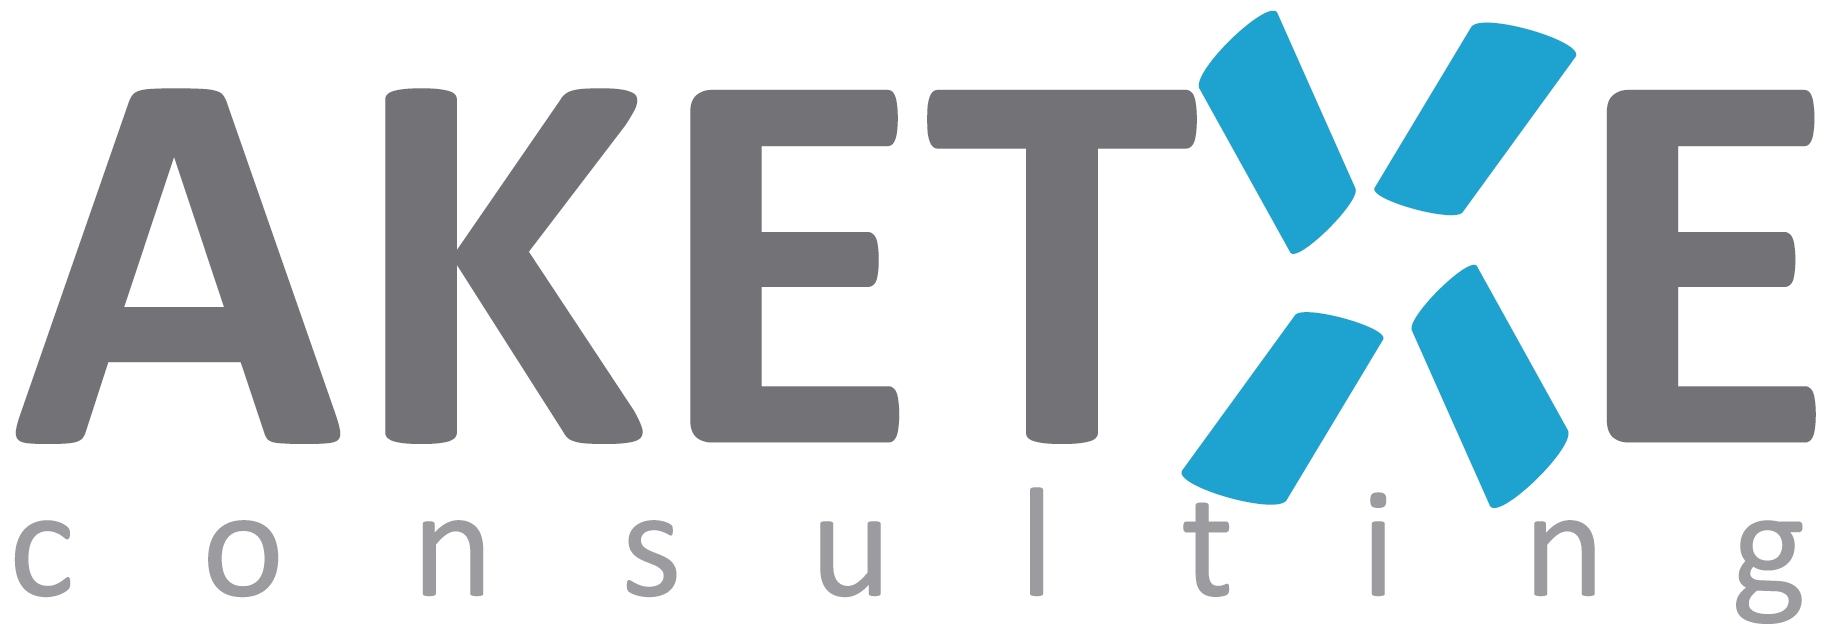 AKETXE Consulting